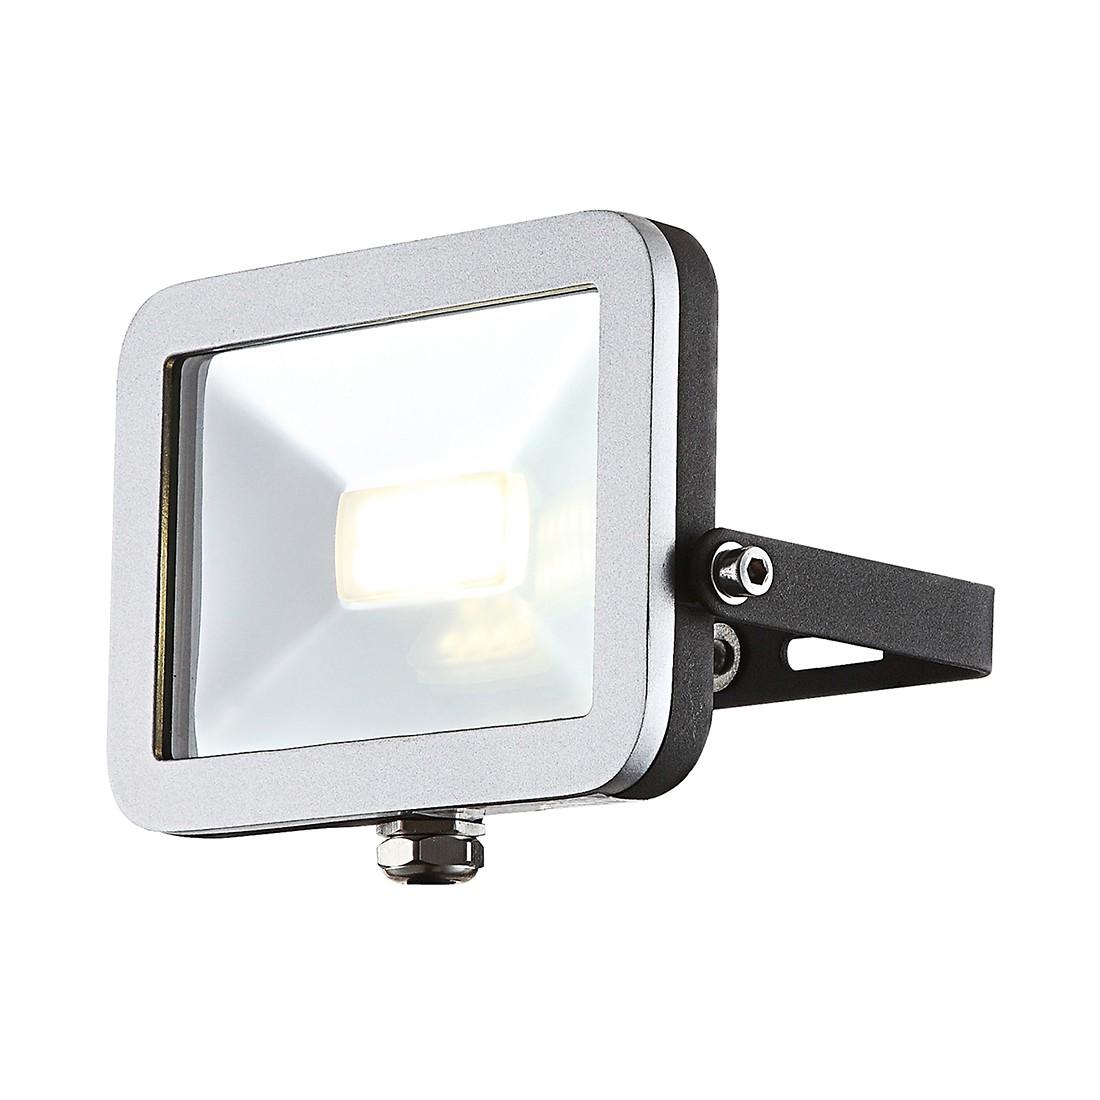 Außenleuchte Construction II ● Silber & Grau ● Aluminium Druckguß- Globo Lighting A+